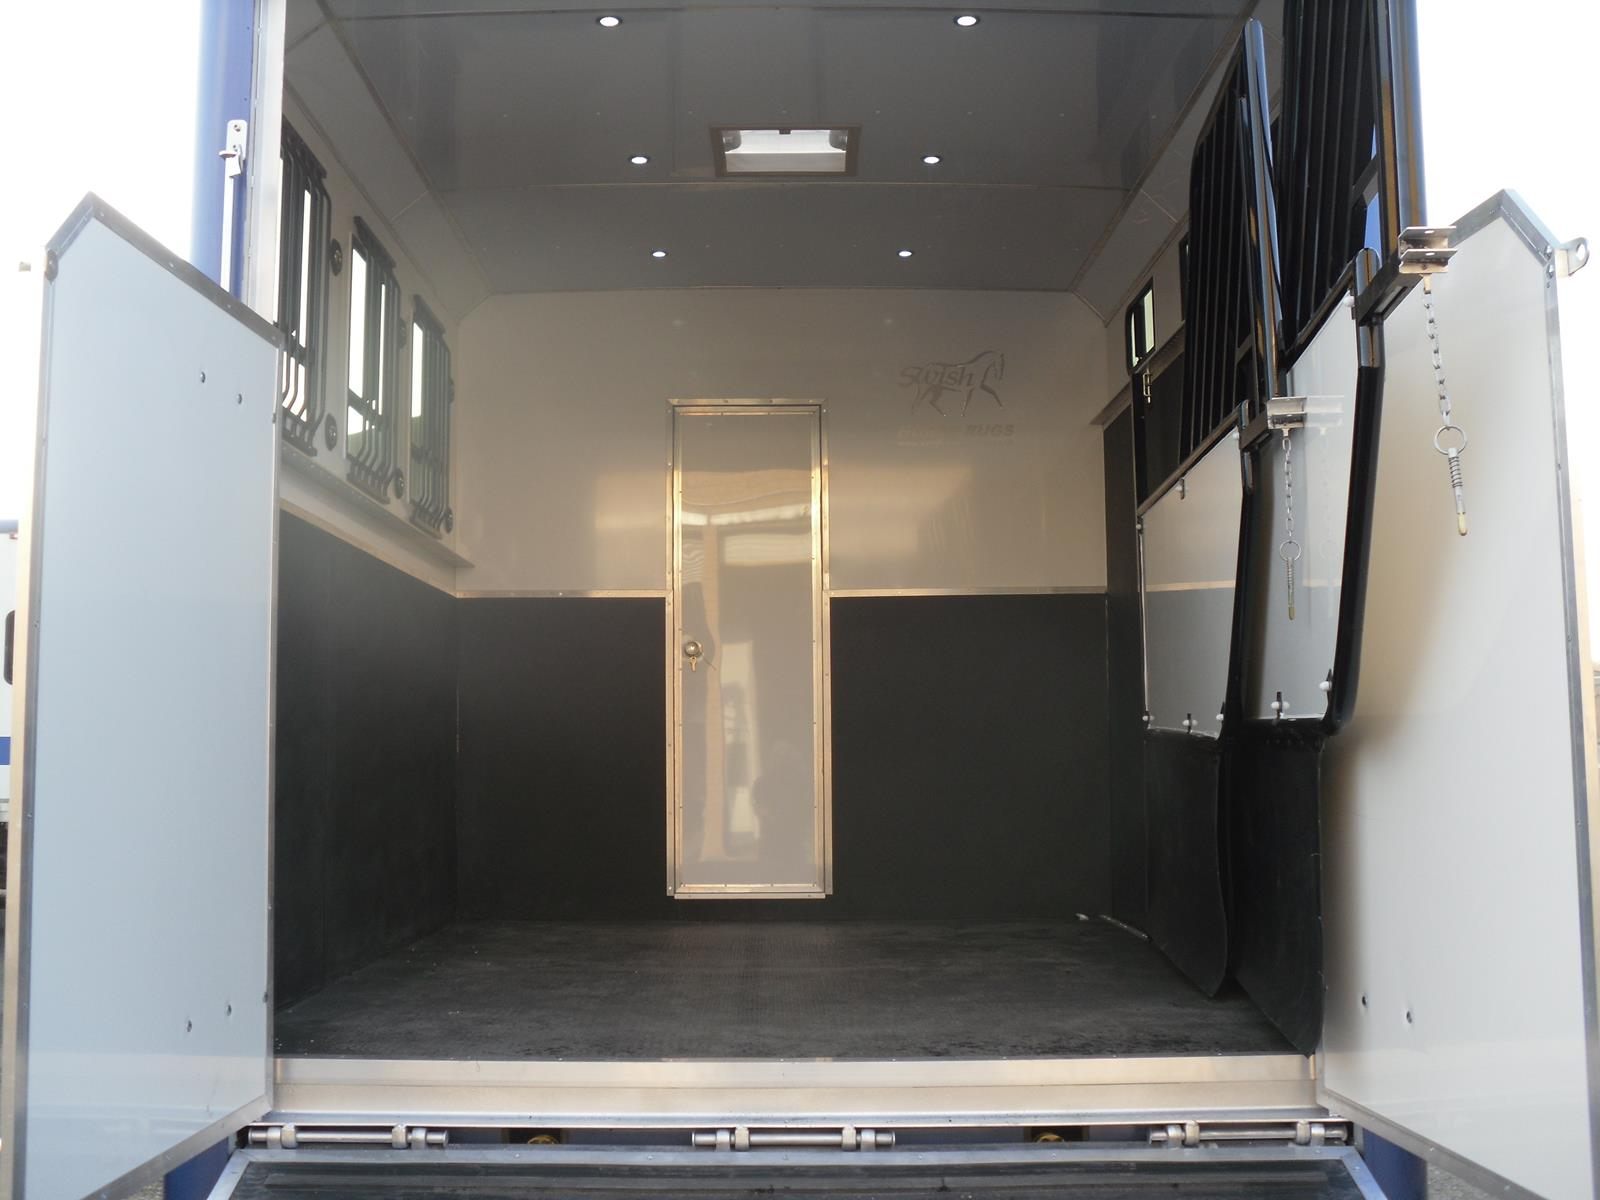 7 5 Ton Horsebox With Full Living Hardcastle Horseboxes